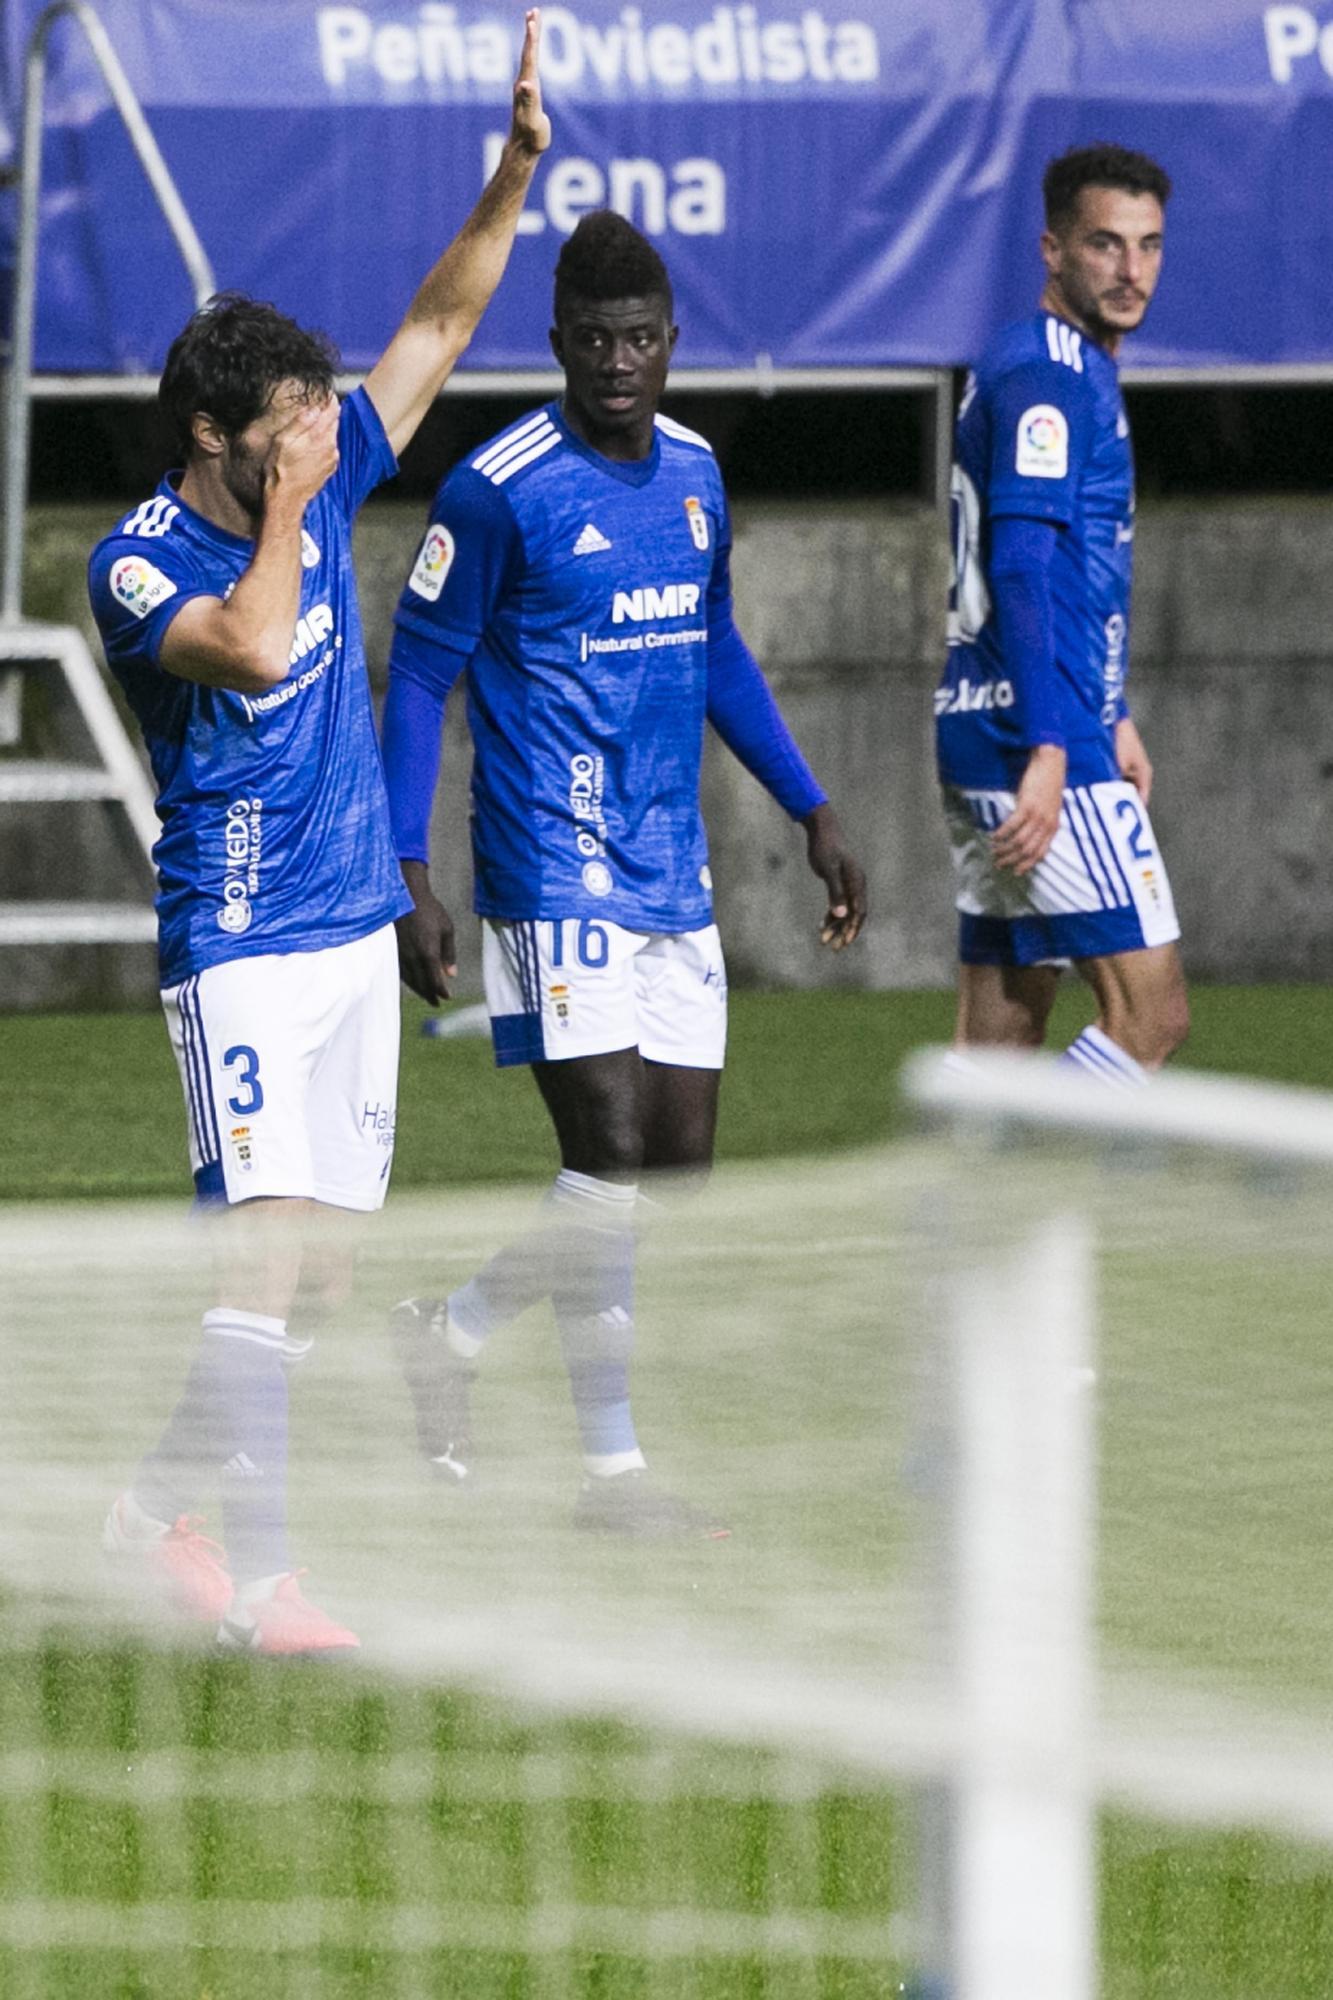 Real Oviedo 2 - 3 UD Logroñés